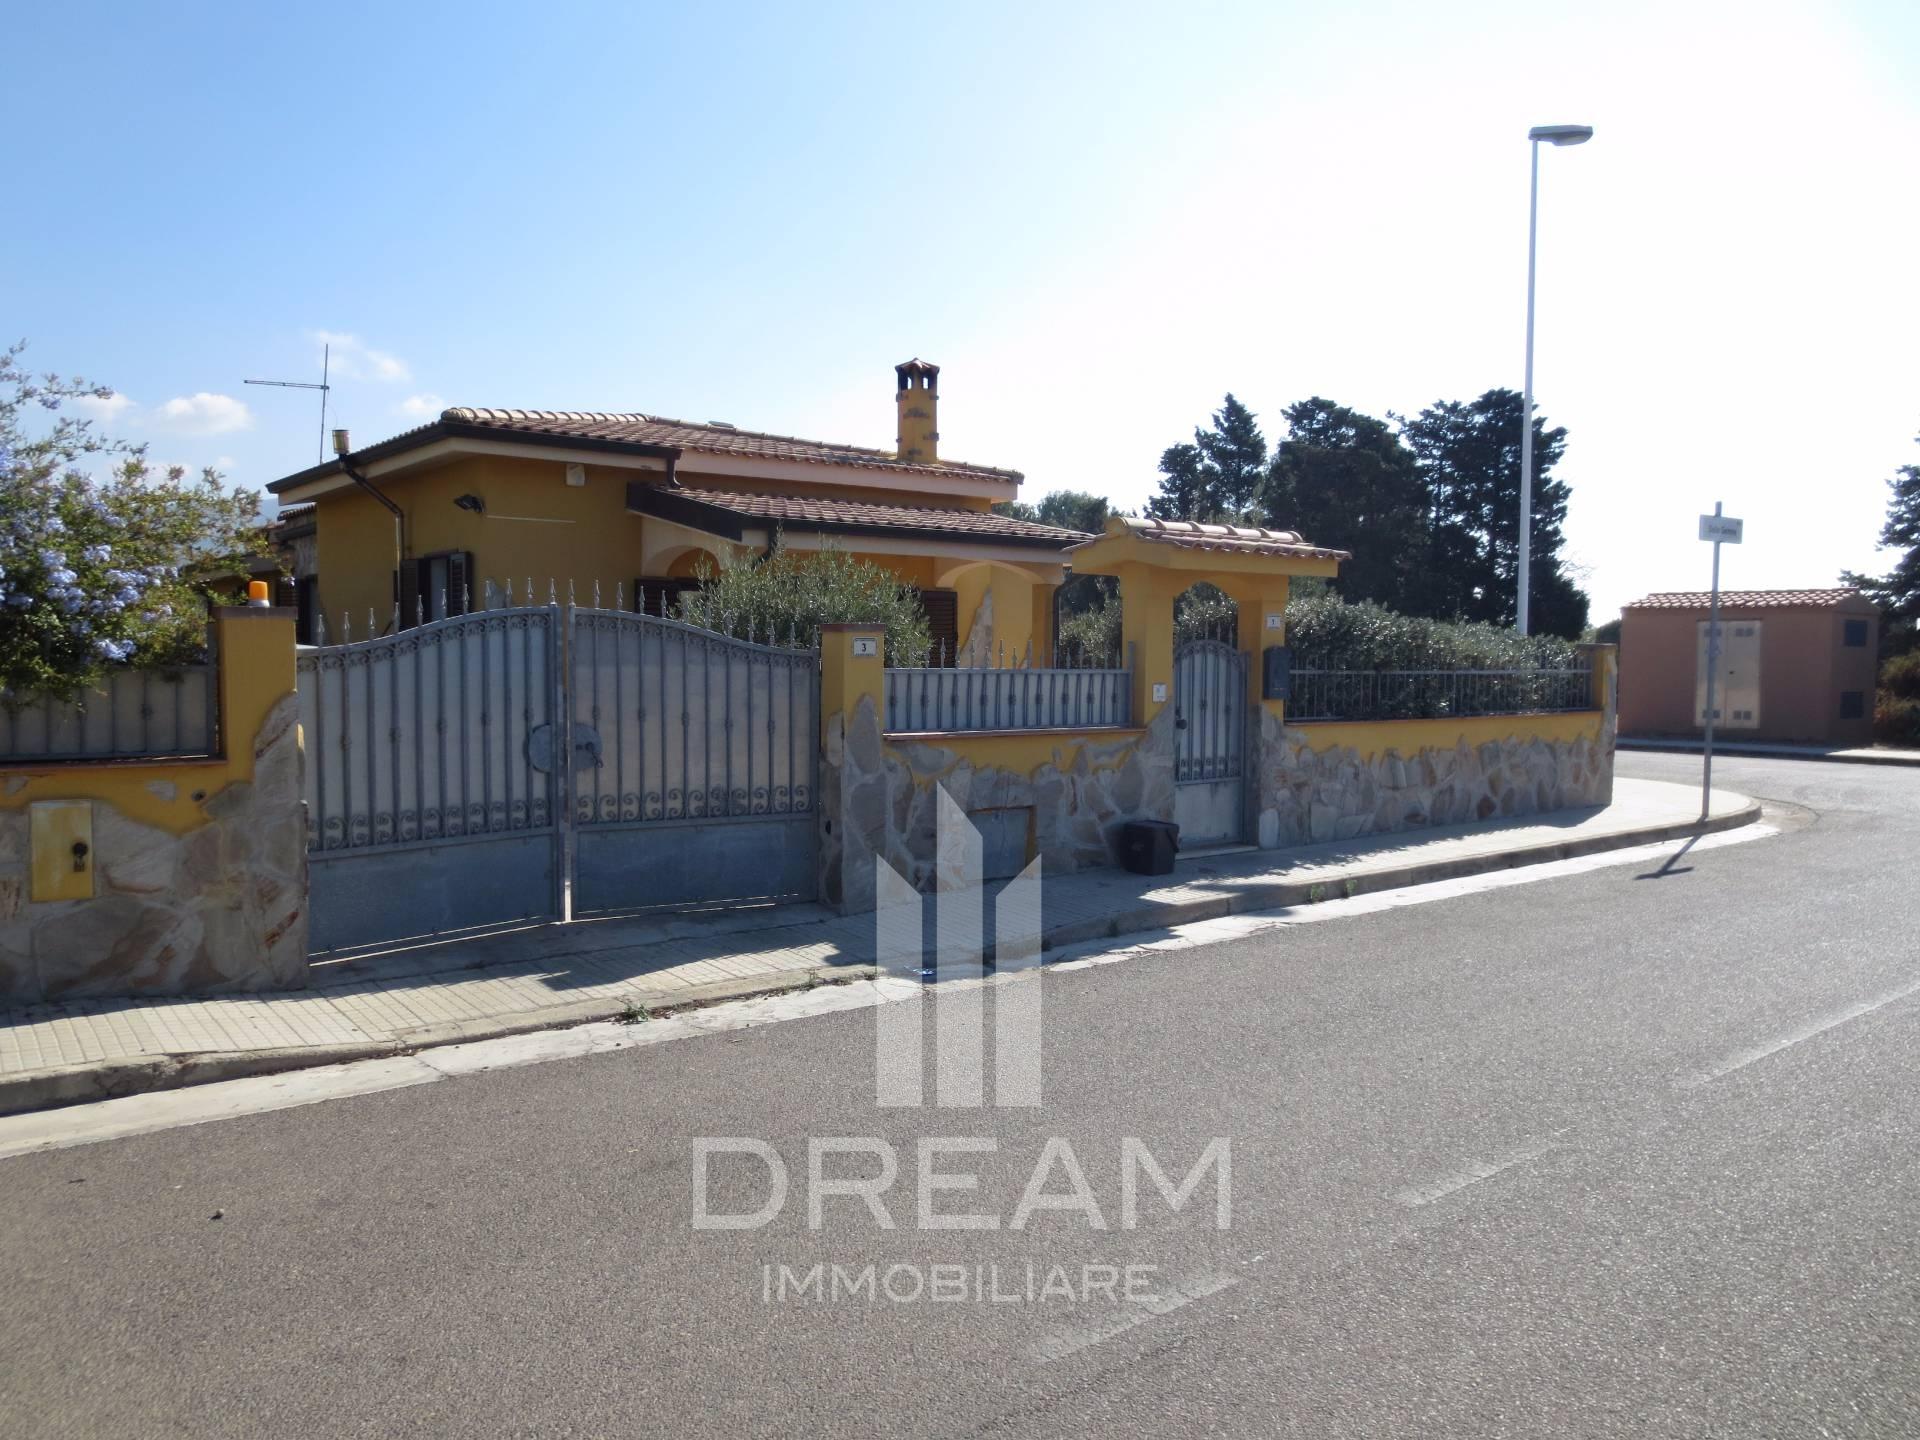 Ufficio Postale A Quartu Sant Elena : Villa in vendita a quartu santelena cod. a643